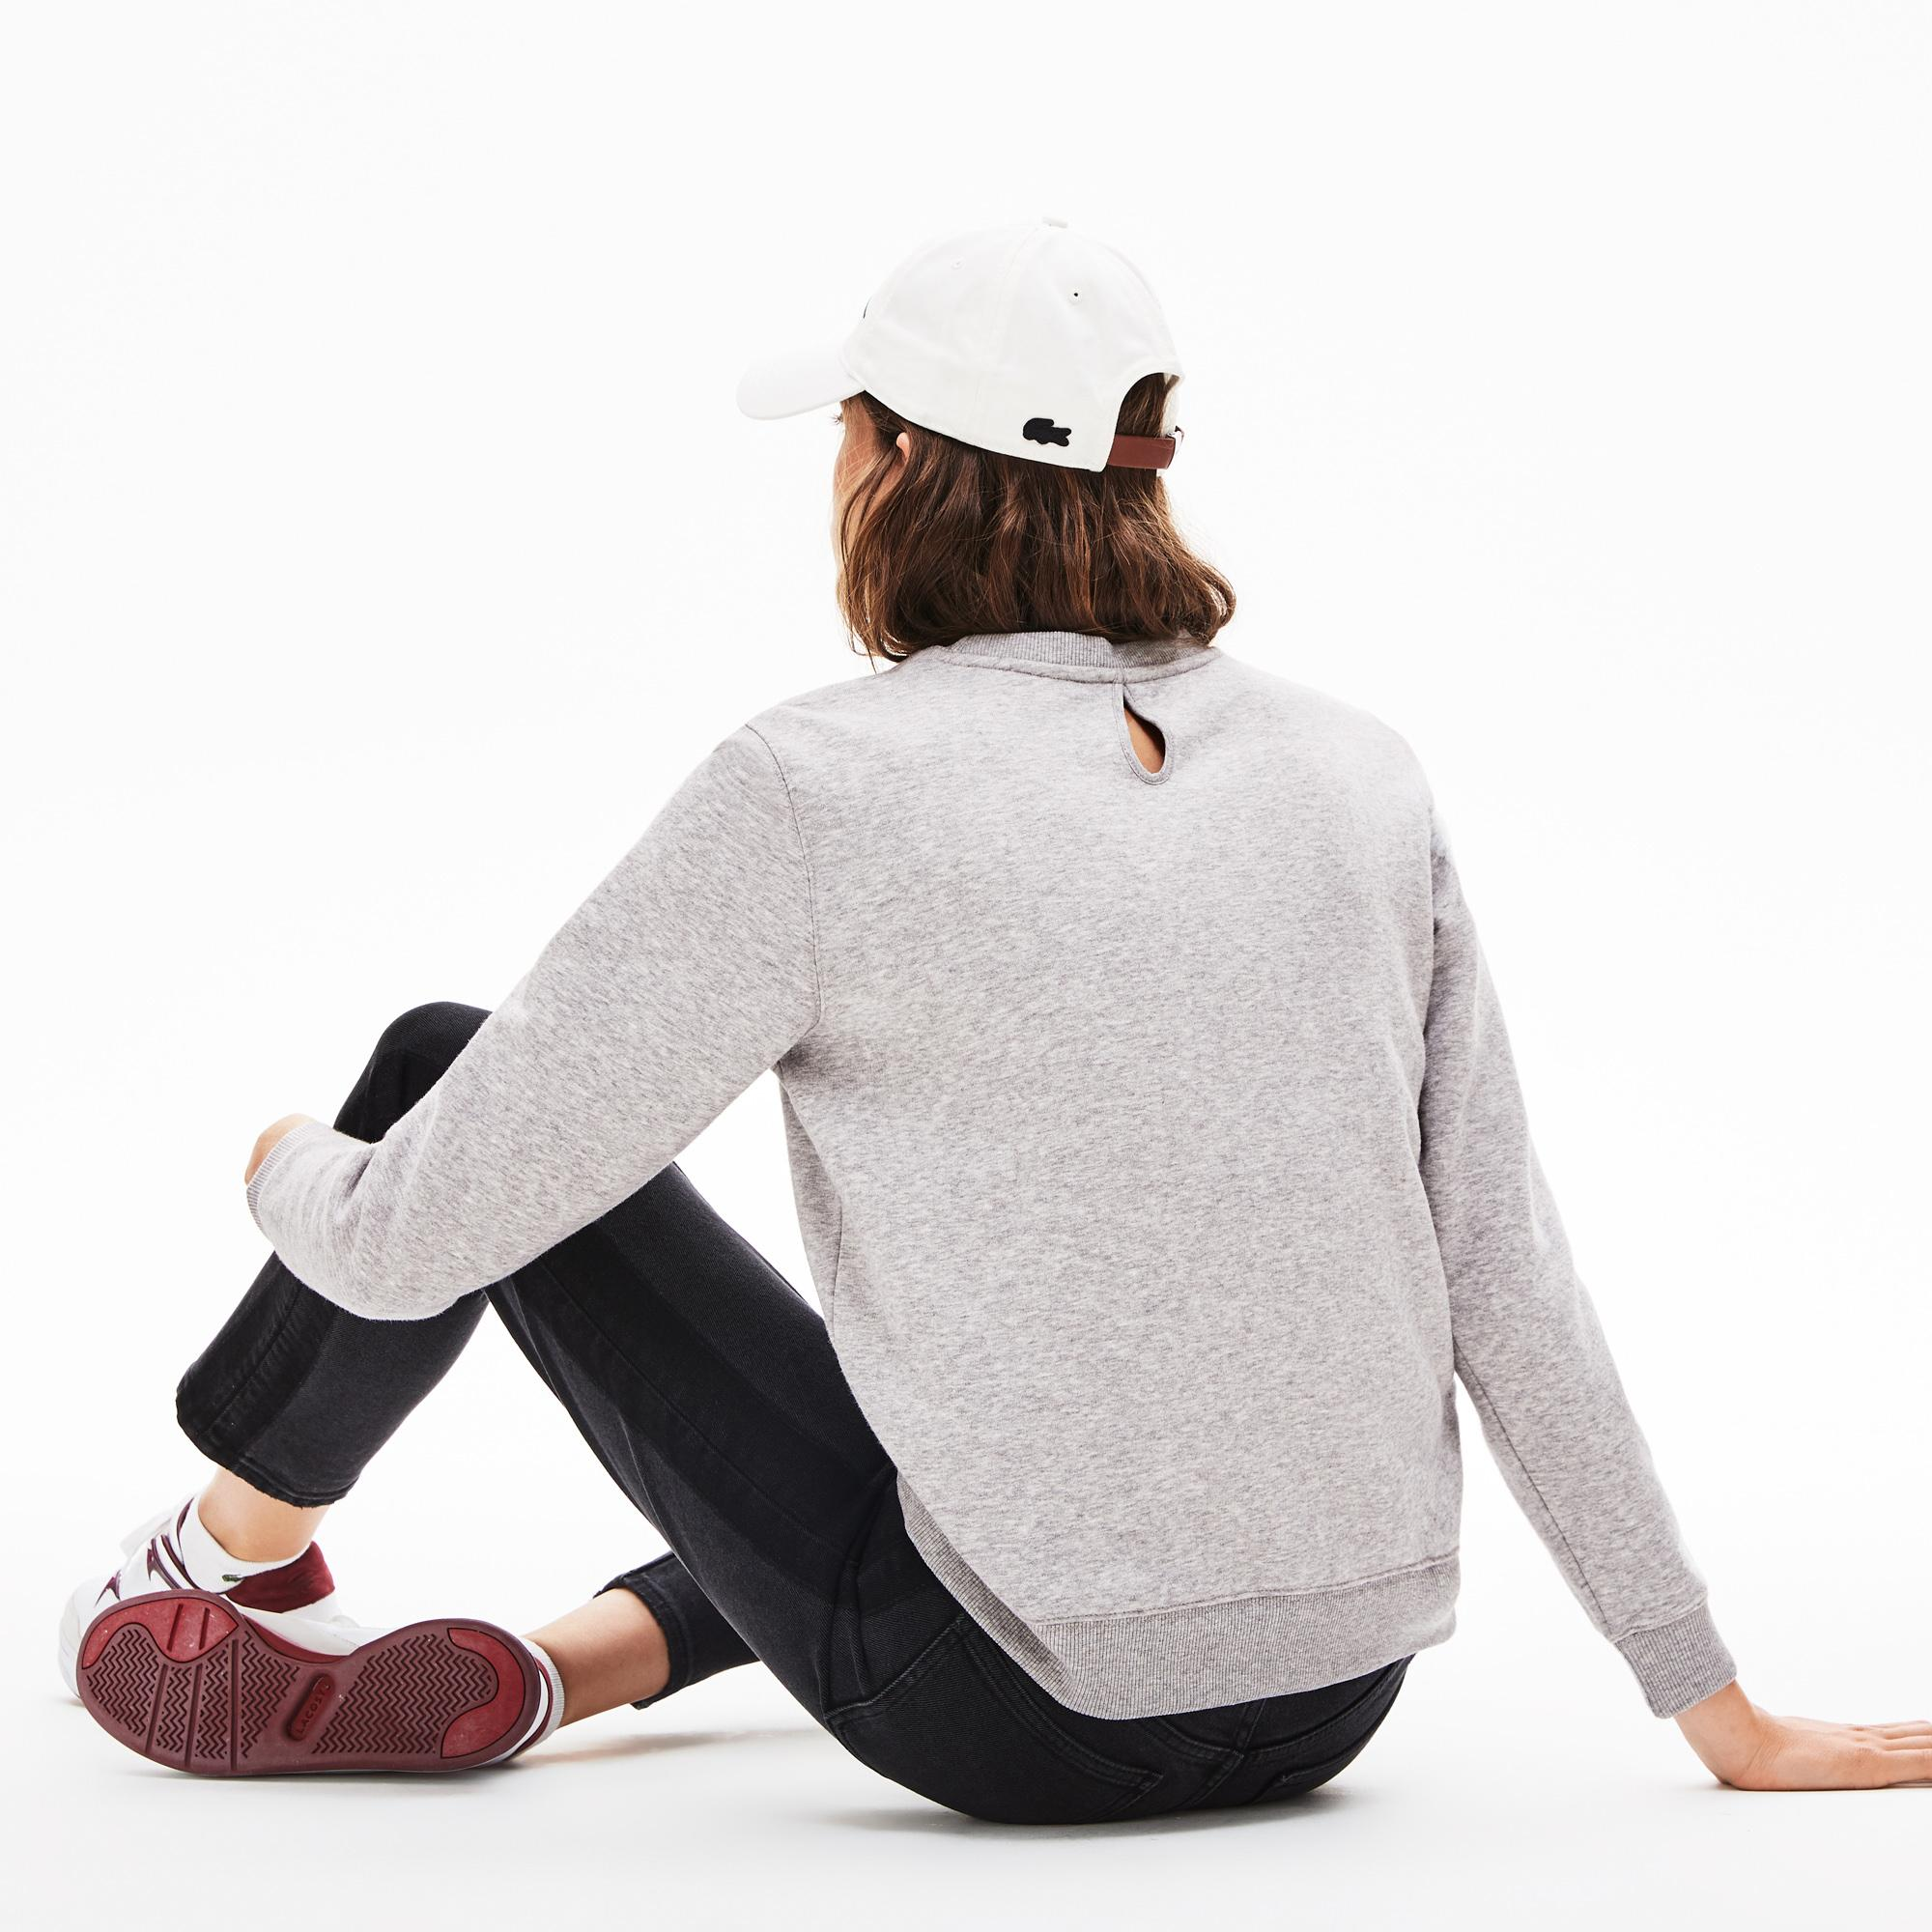 Lacoste L!VE Kadın Regular Fit Bisiklet Yaka Gri Sweatshirt